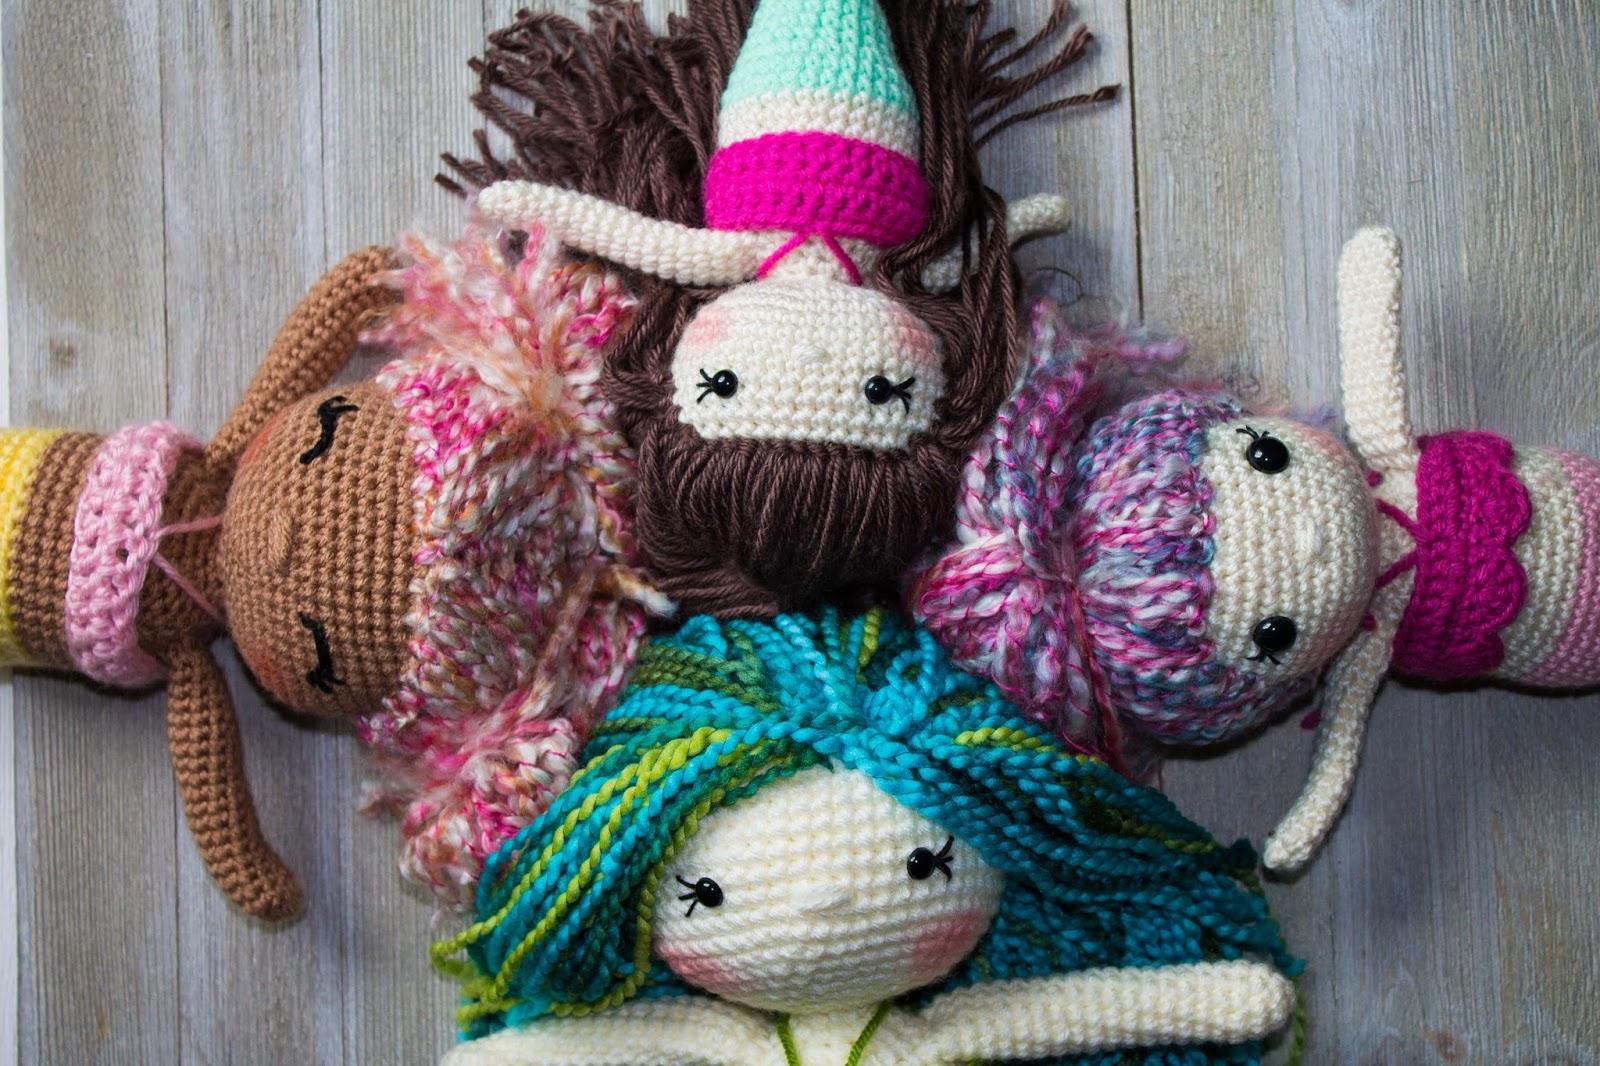 Free Amigurumi Mermaid Patterns : The friendly mermaid crochet doll thefriendlyredfox